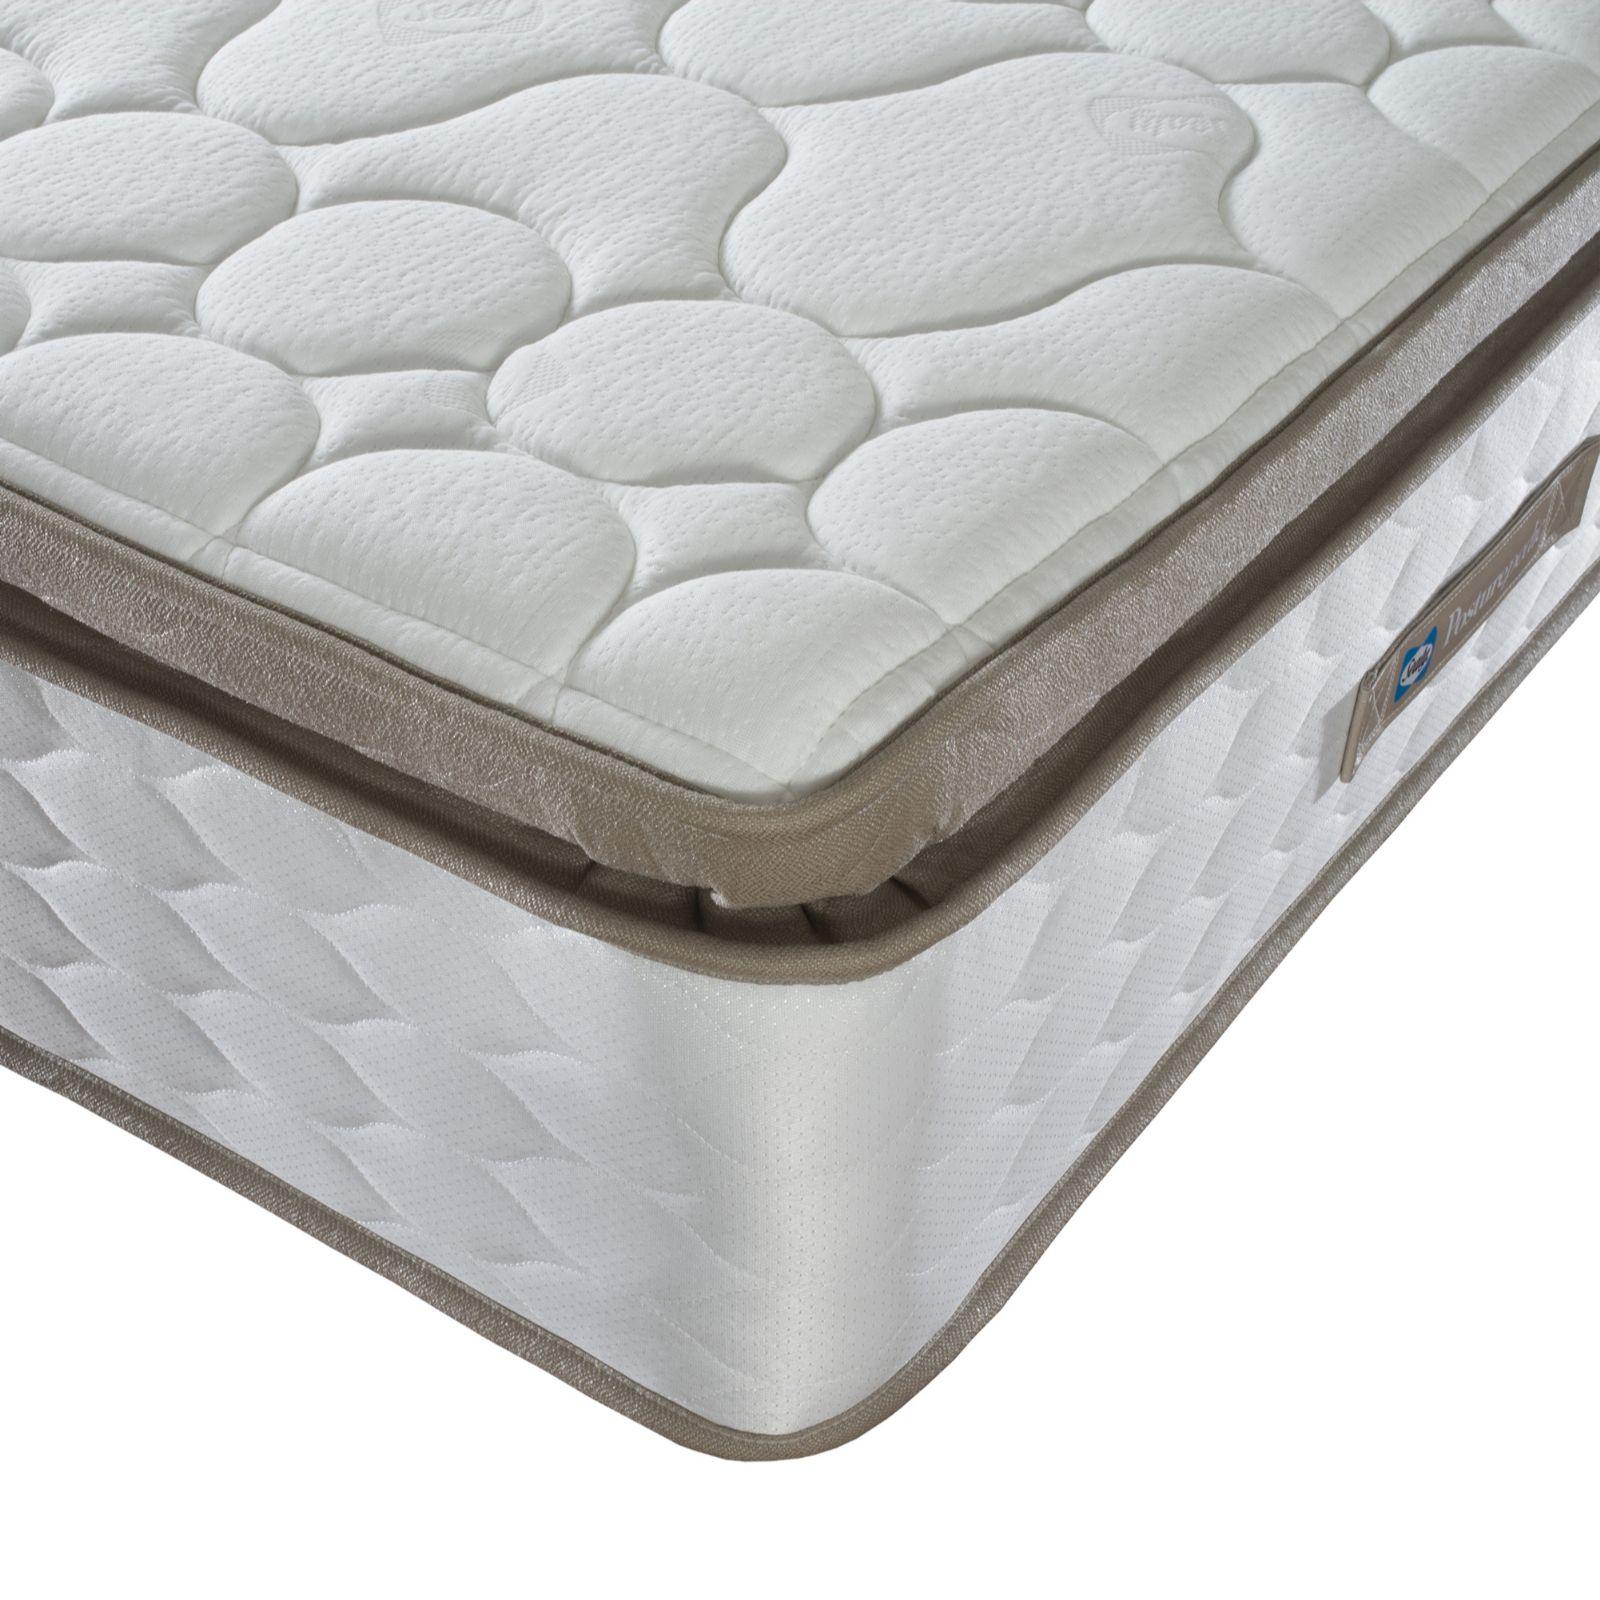 Sealy Posturepedic 660 Spring Geltex Pillow Top Mattress - Page 1 - QVC UK